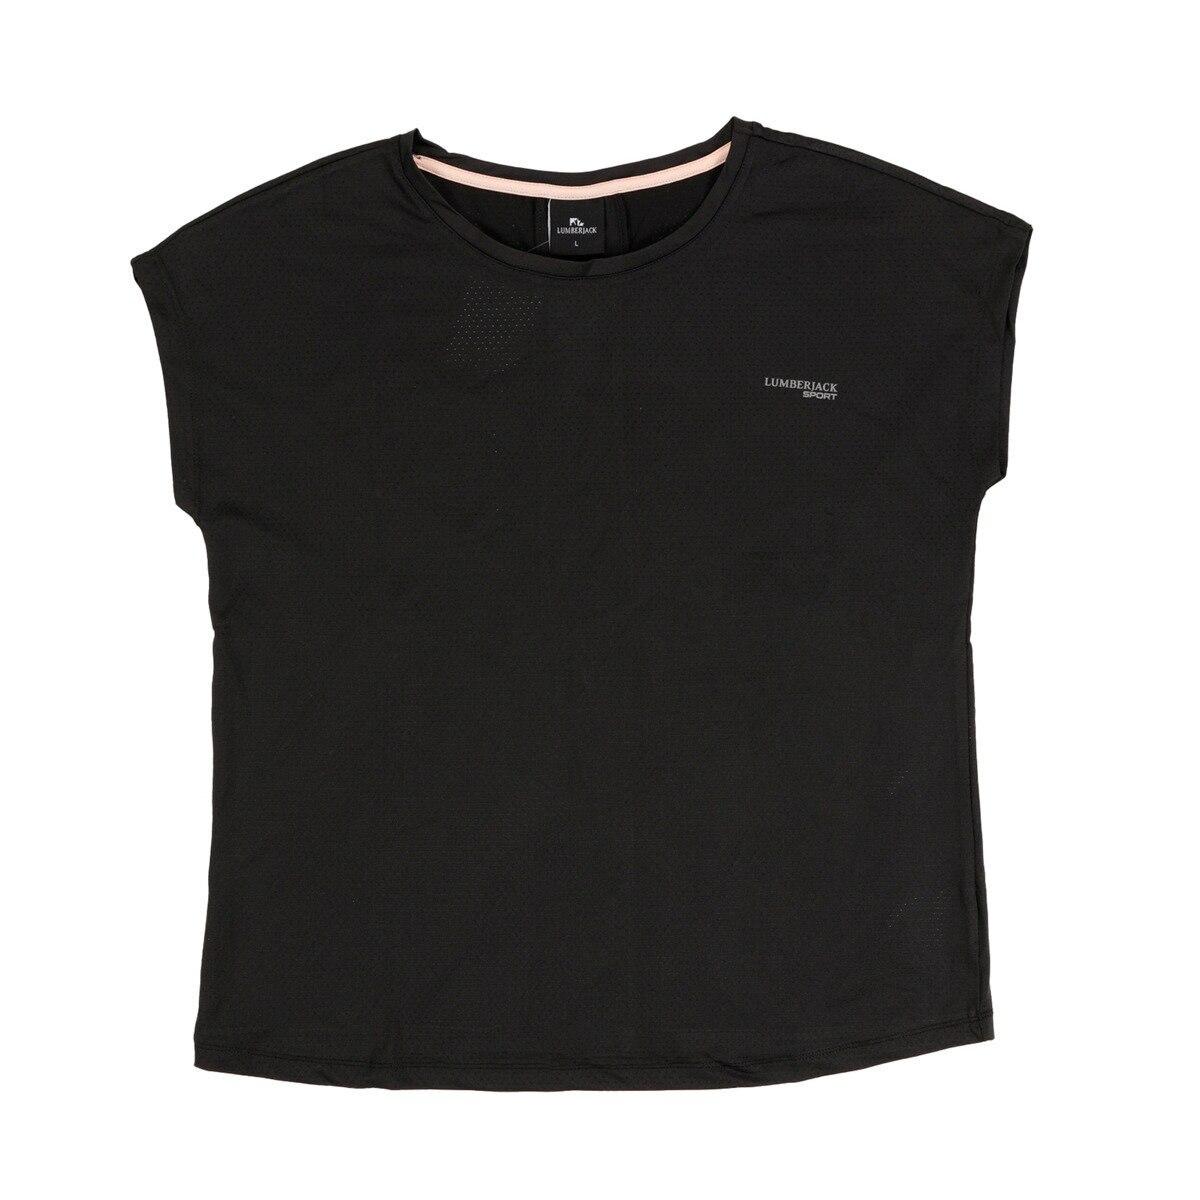 FLO W-1827 TYBALT KK camiseta mujer negro camiseta LUMBERJACK